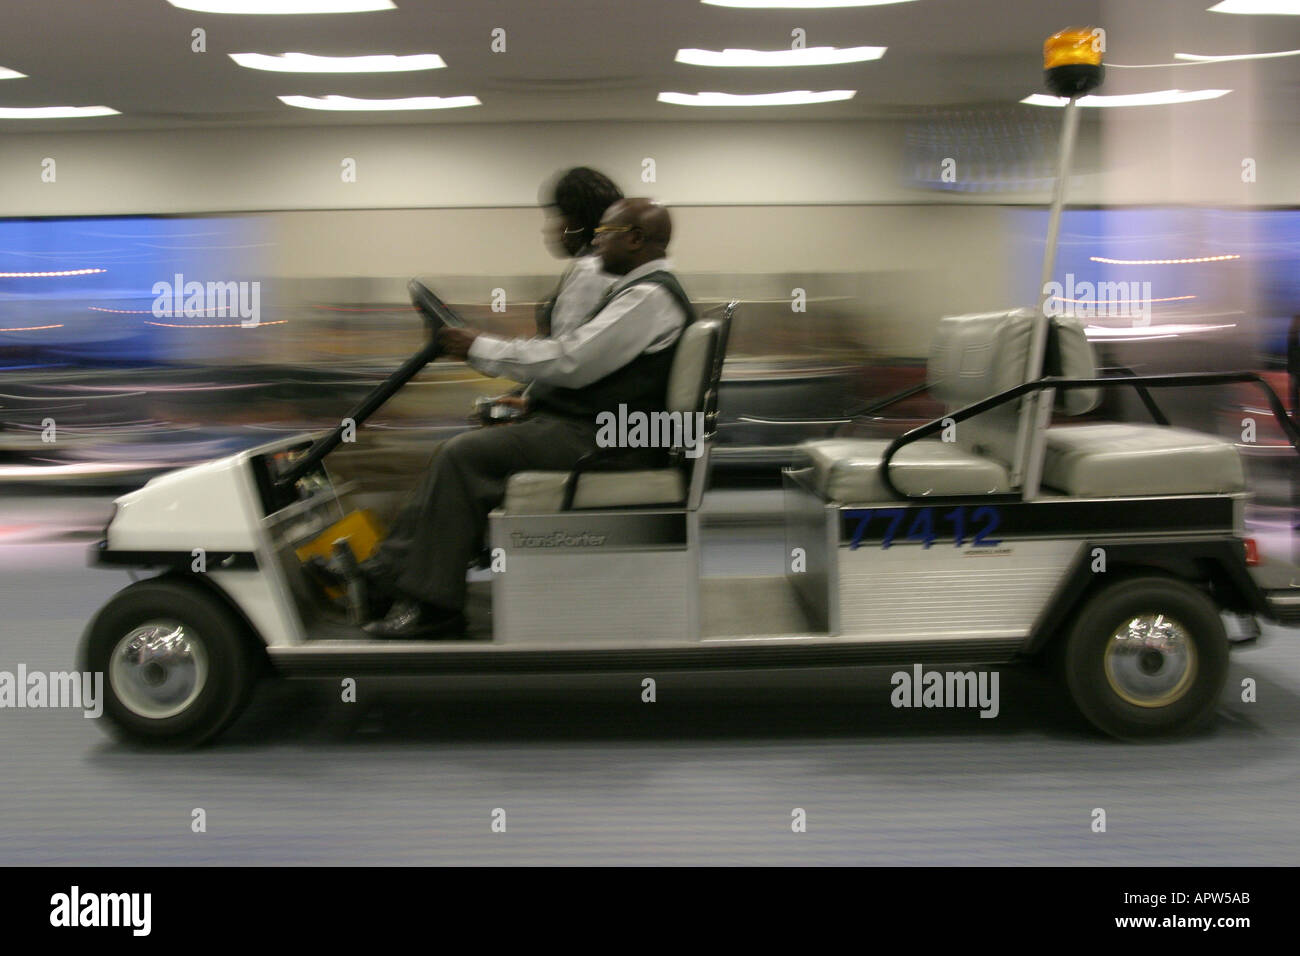 State of georgia motor vehicle vehicle ideas for Atlanta department of motor vehicles